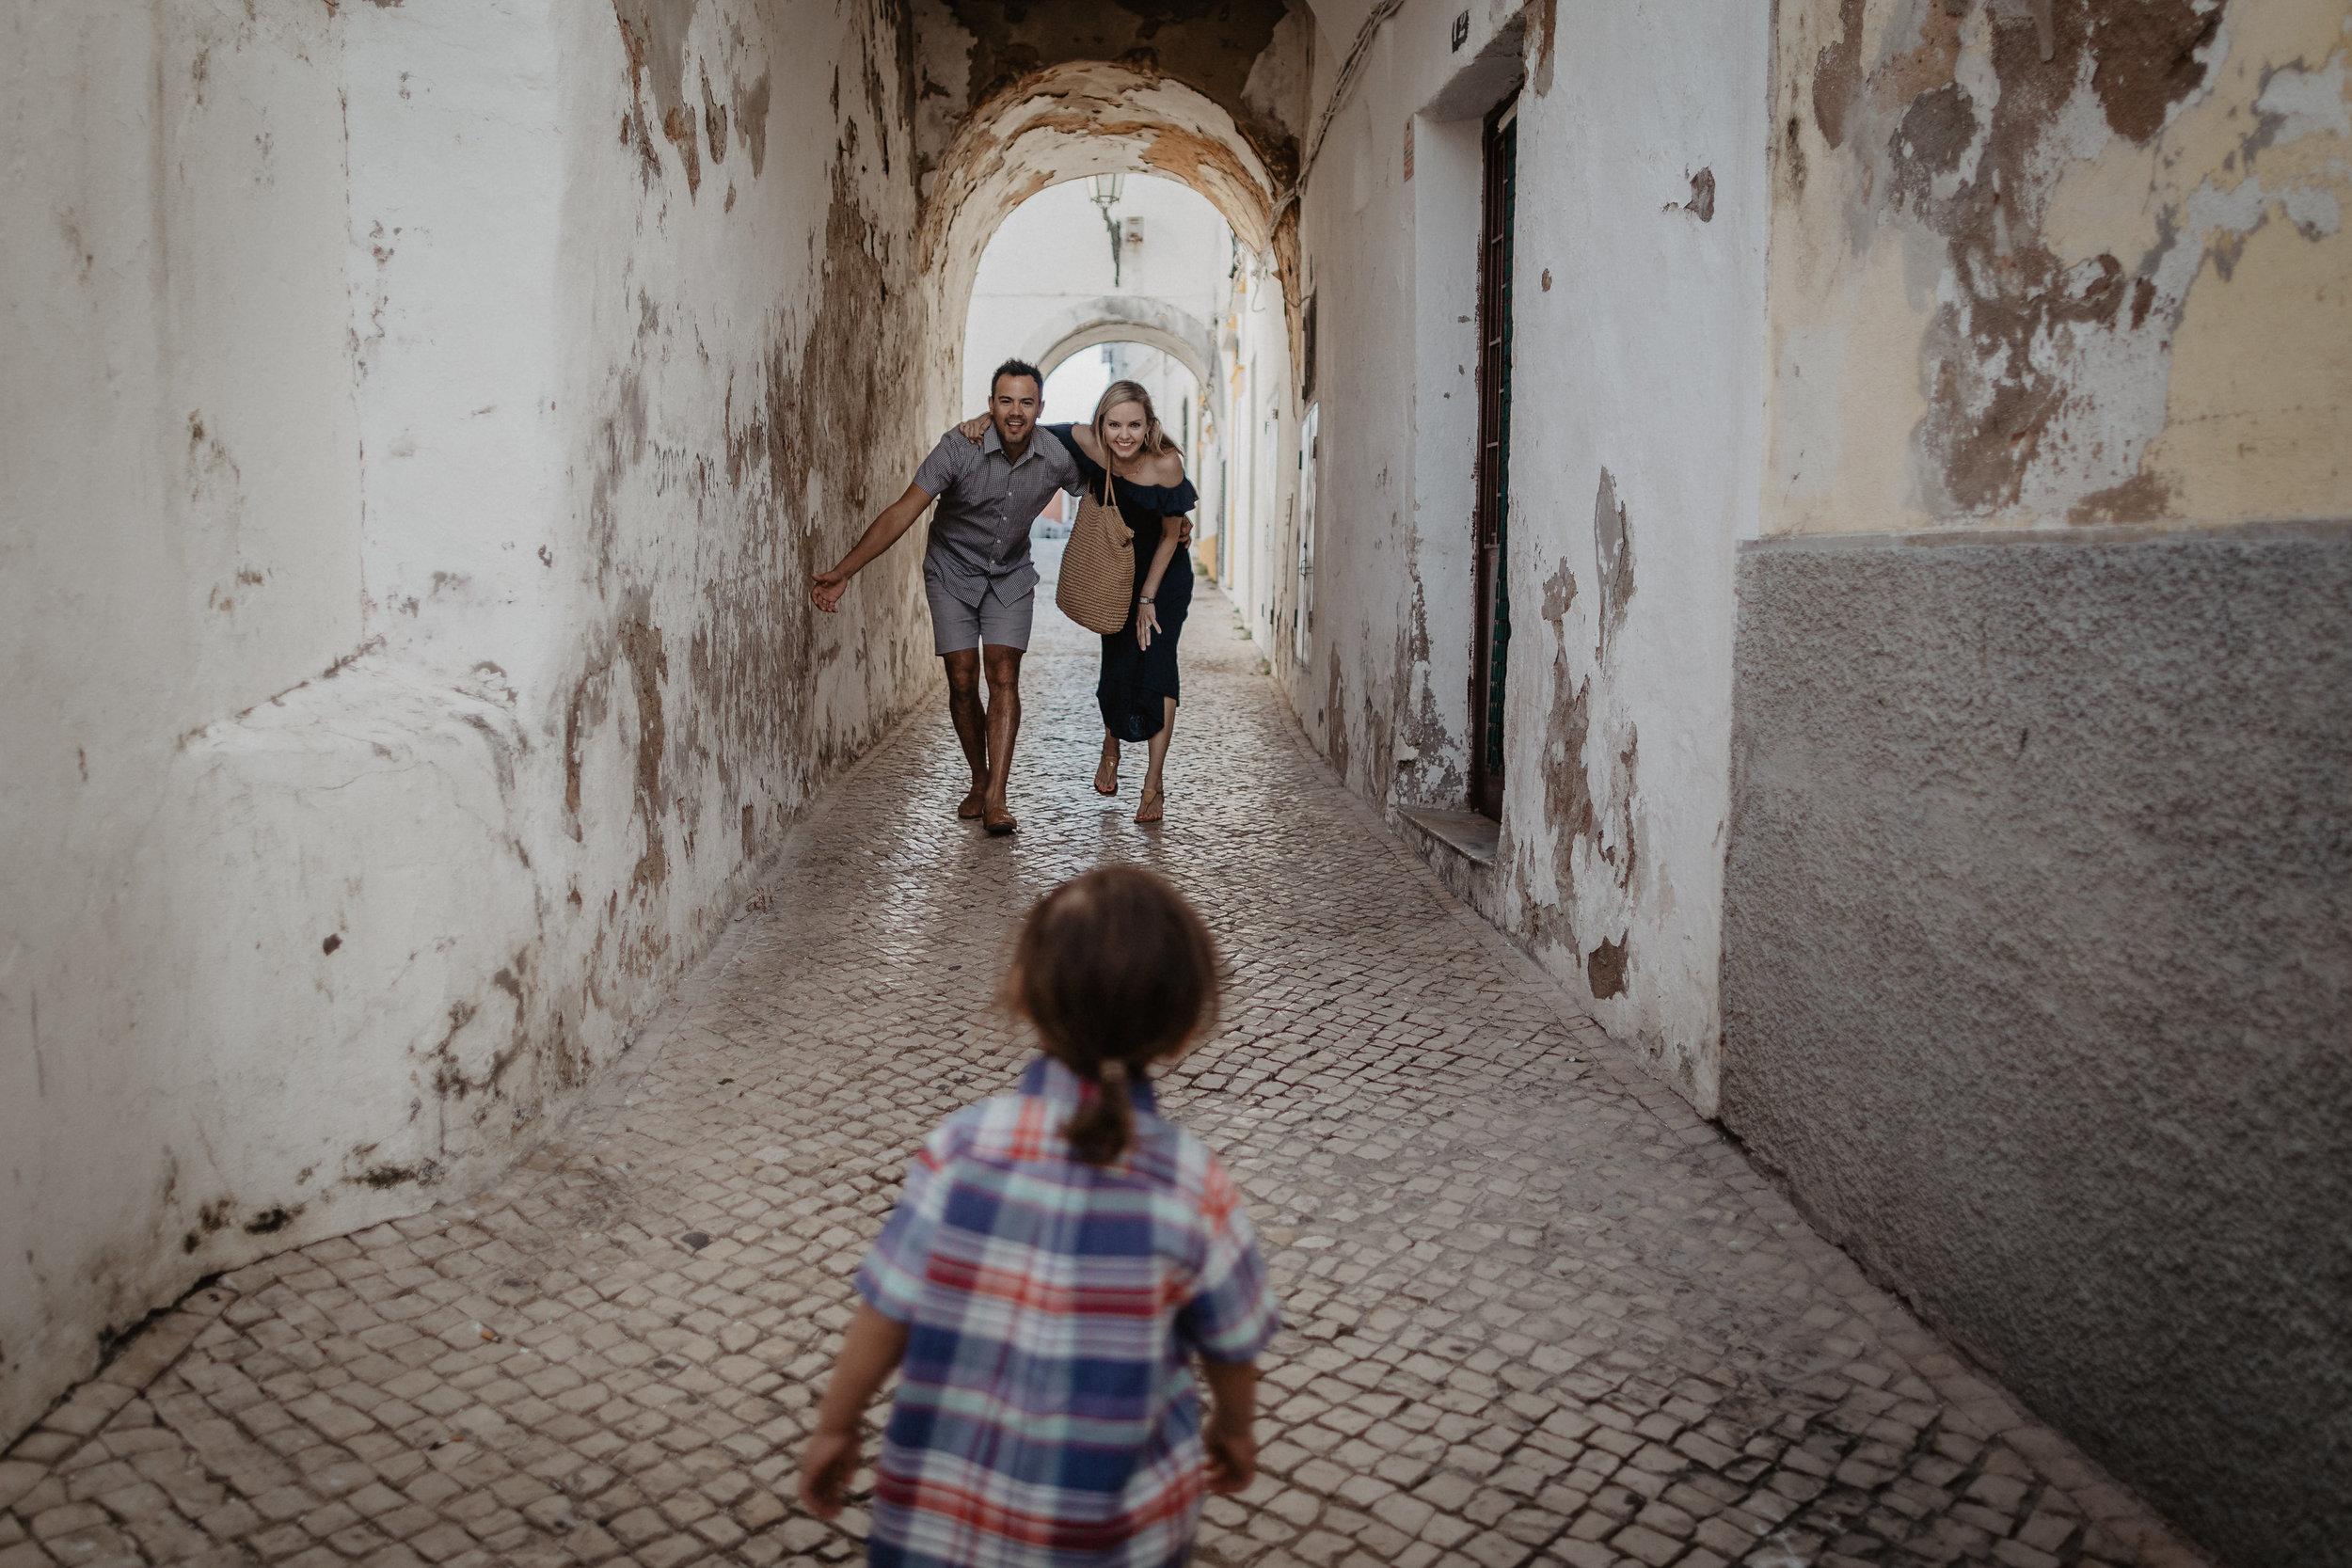 Lapela-Family-photography-Lagos-Algarve14.jpg